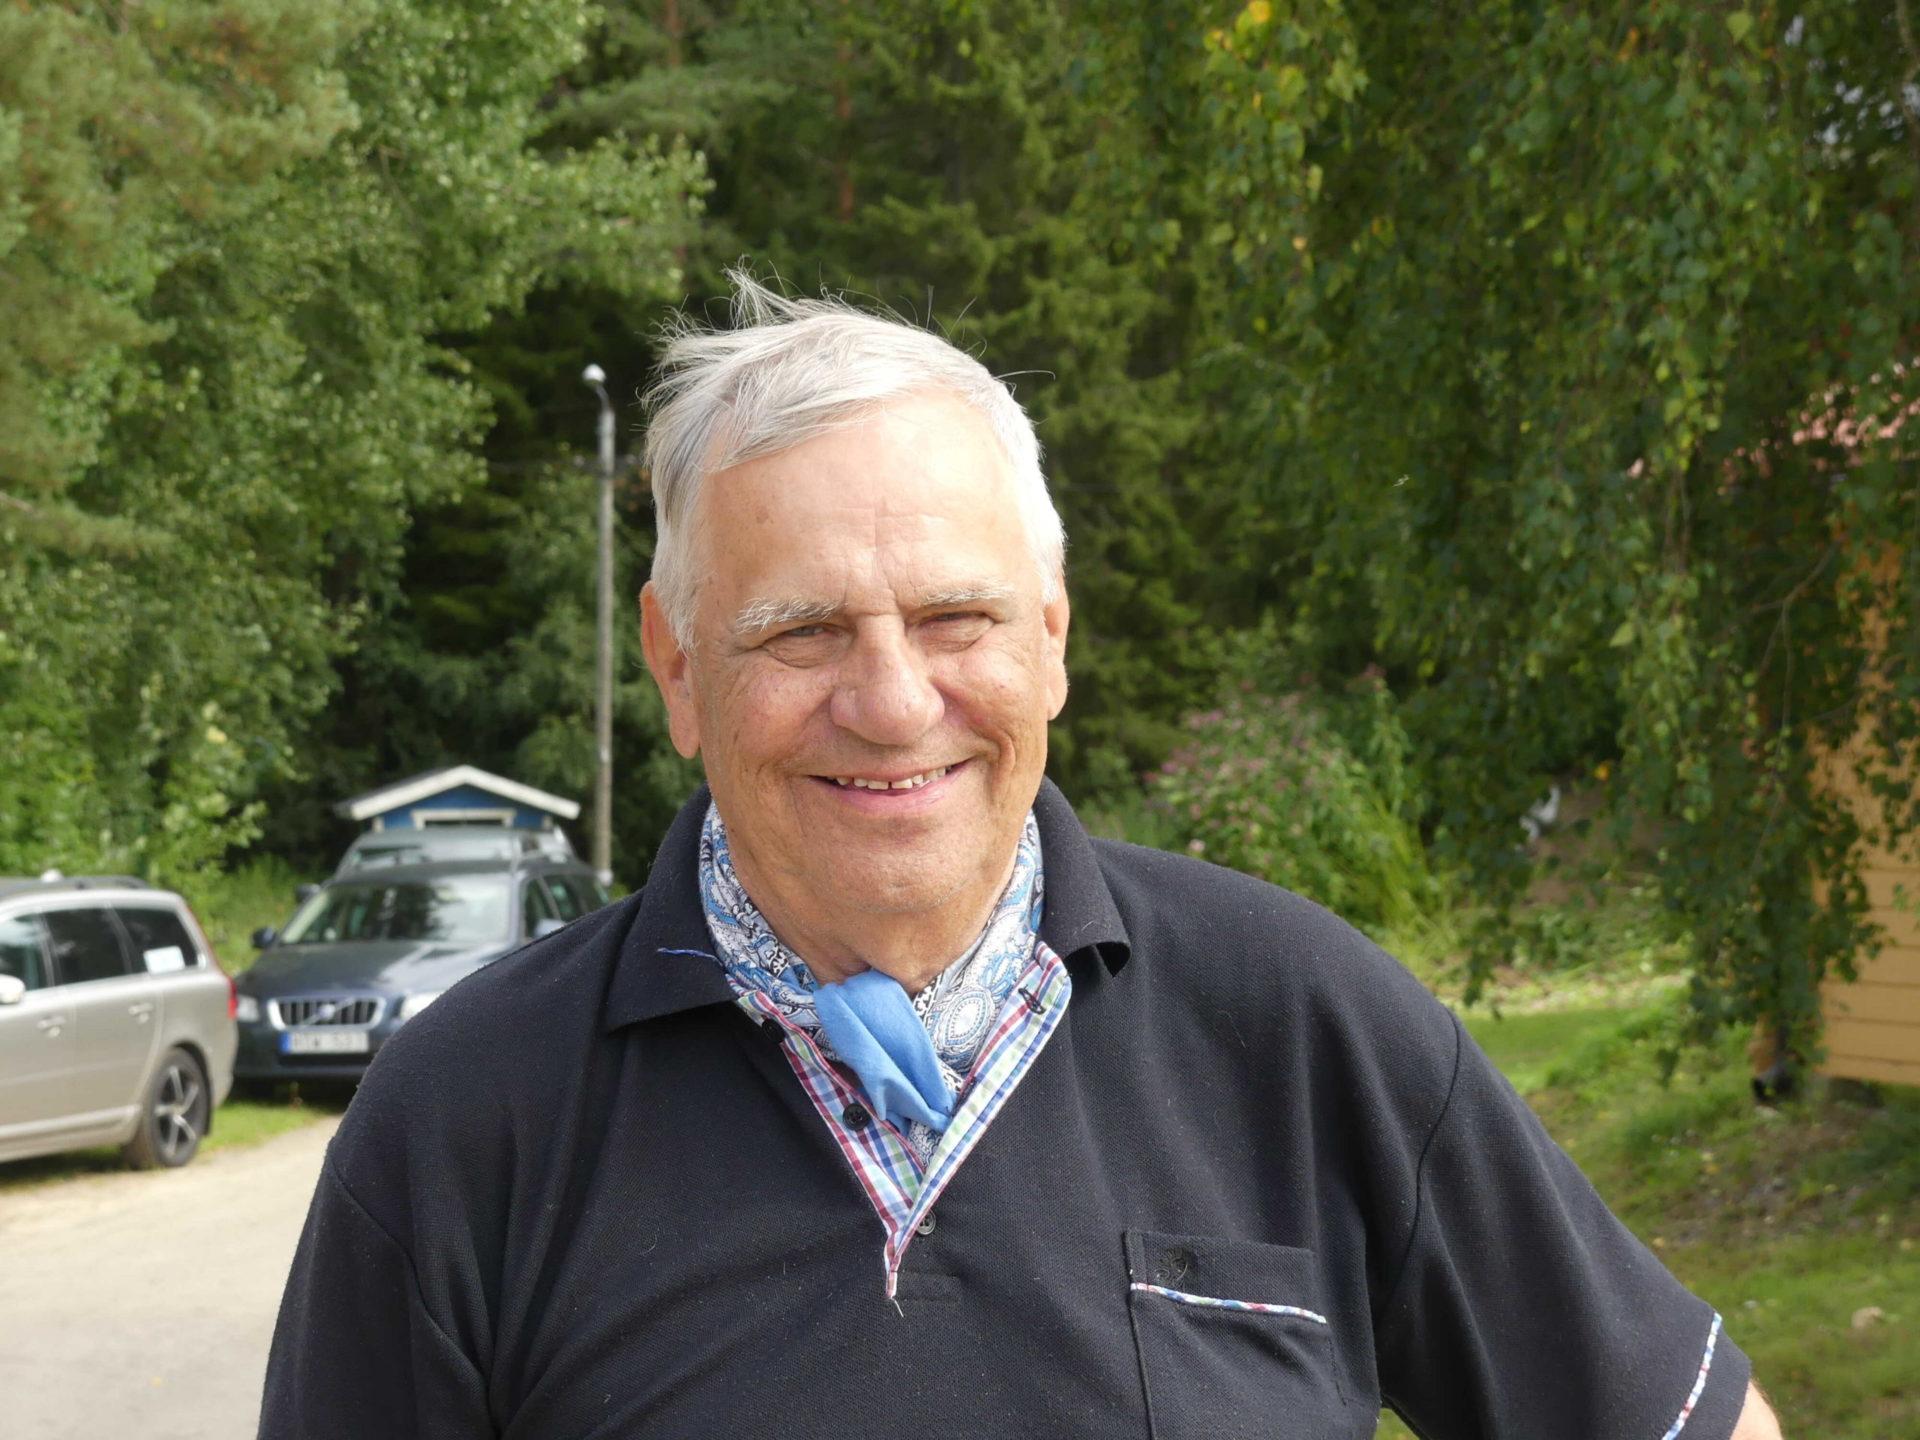 Johnny Löthberg